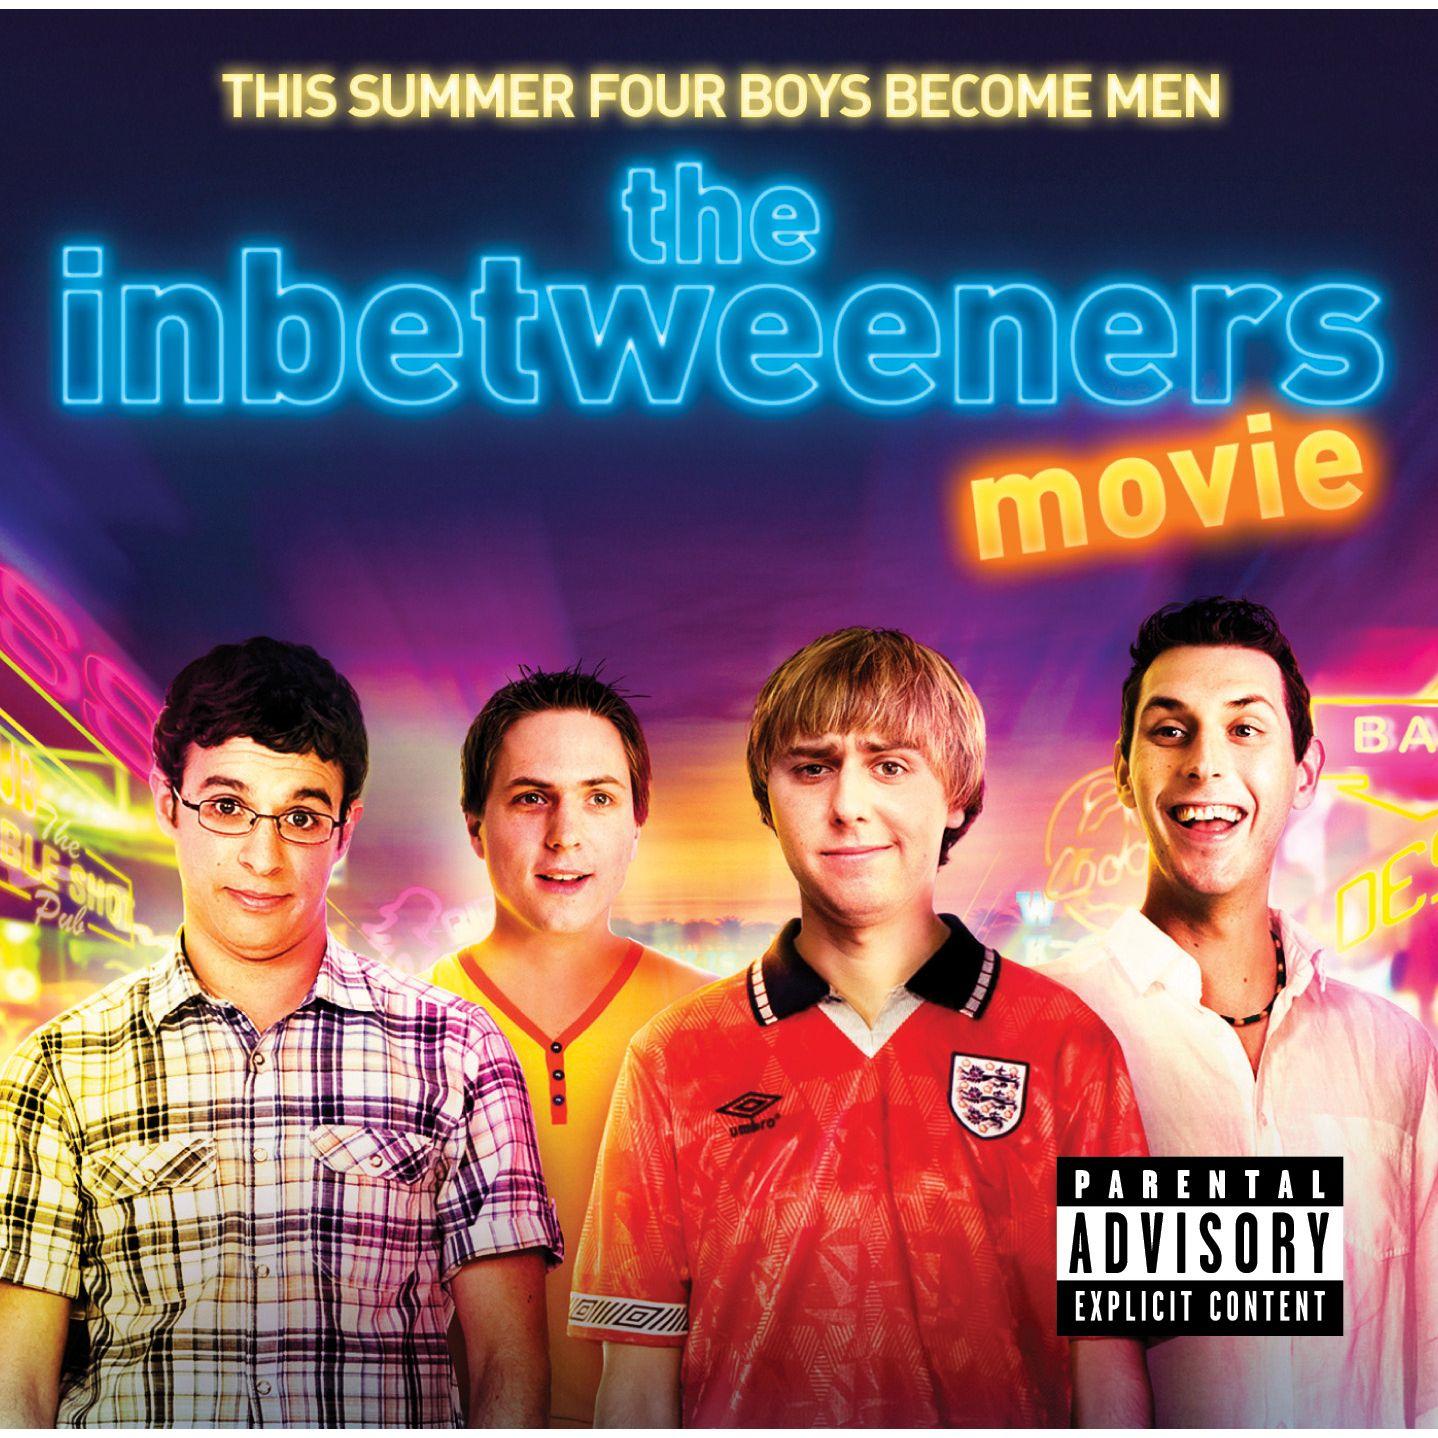 Inbetweeners season 2 episode 1 soundtrack - Lost season